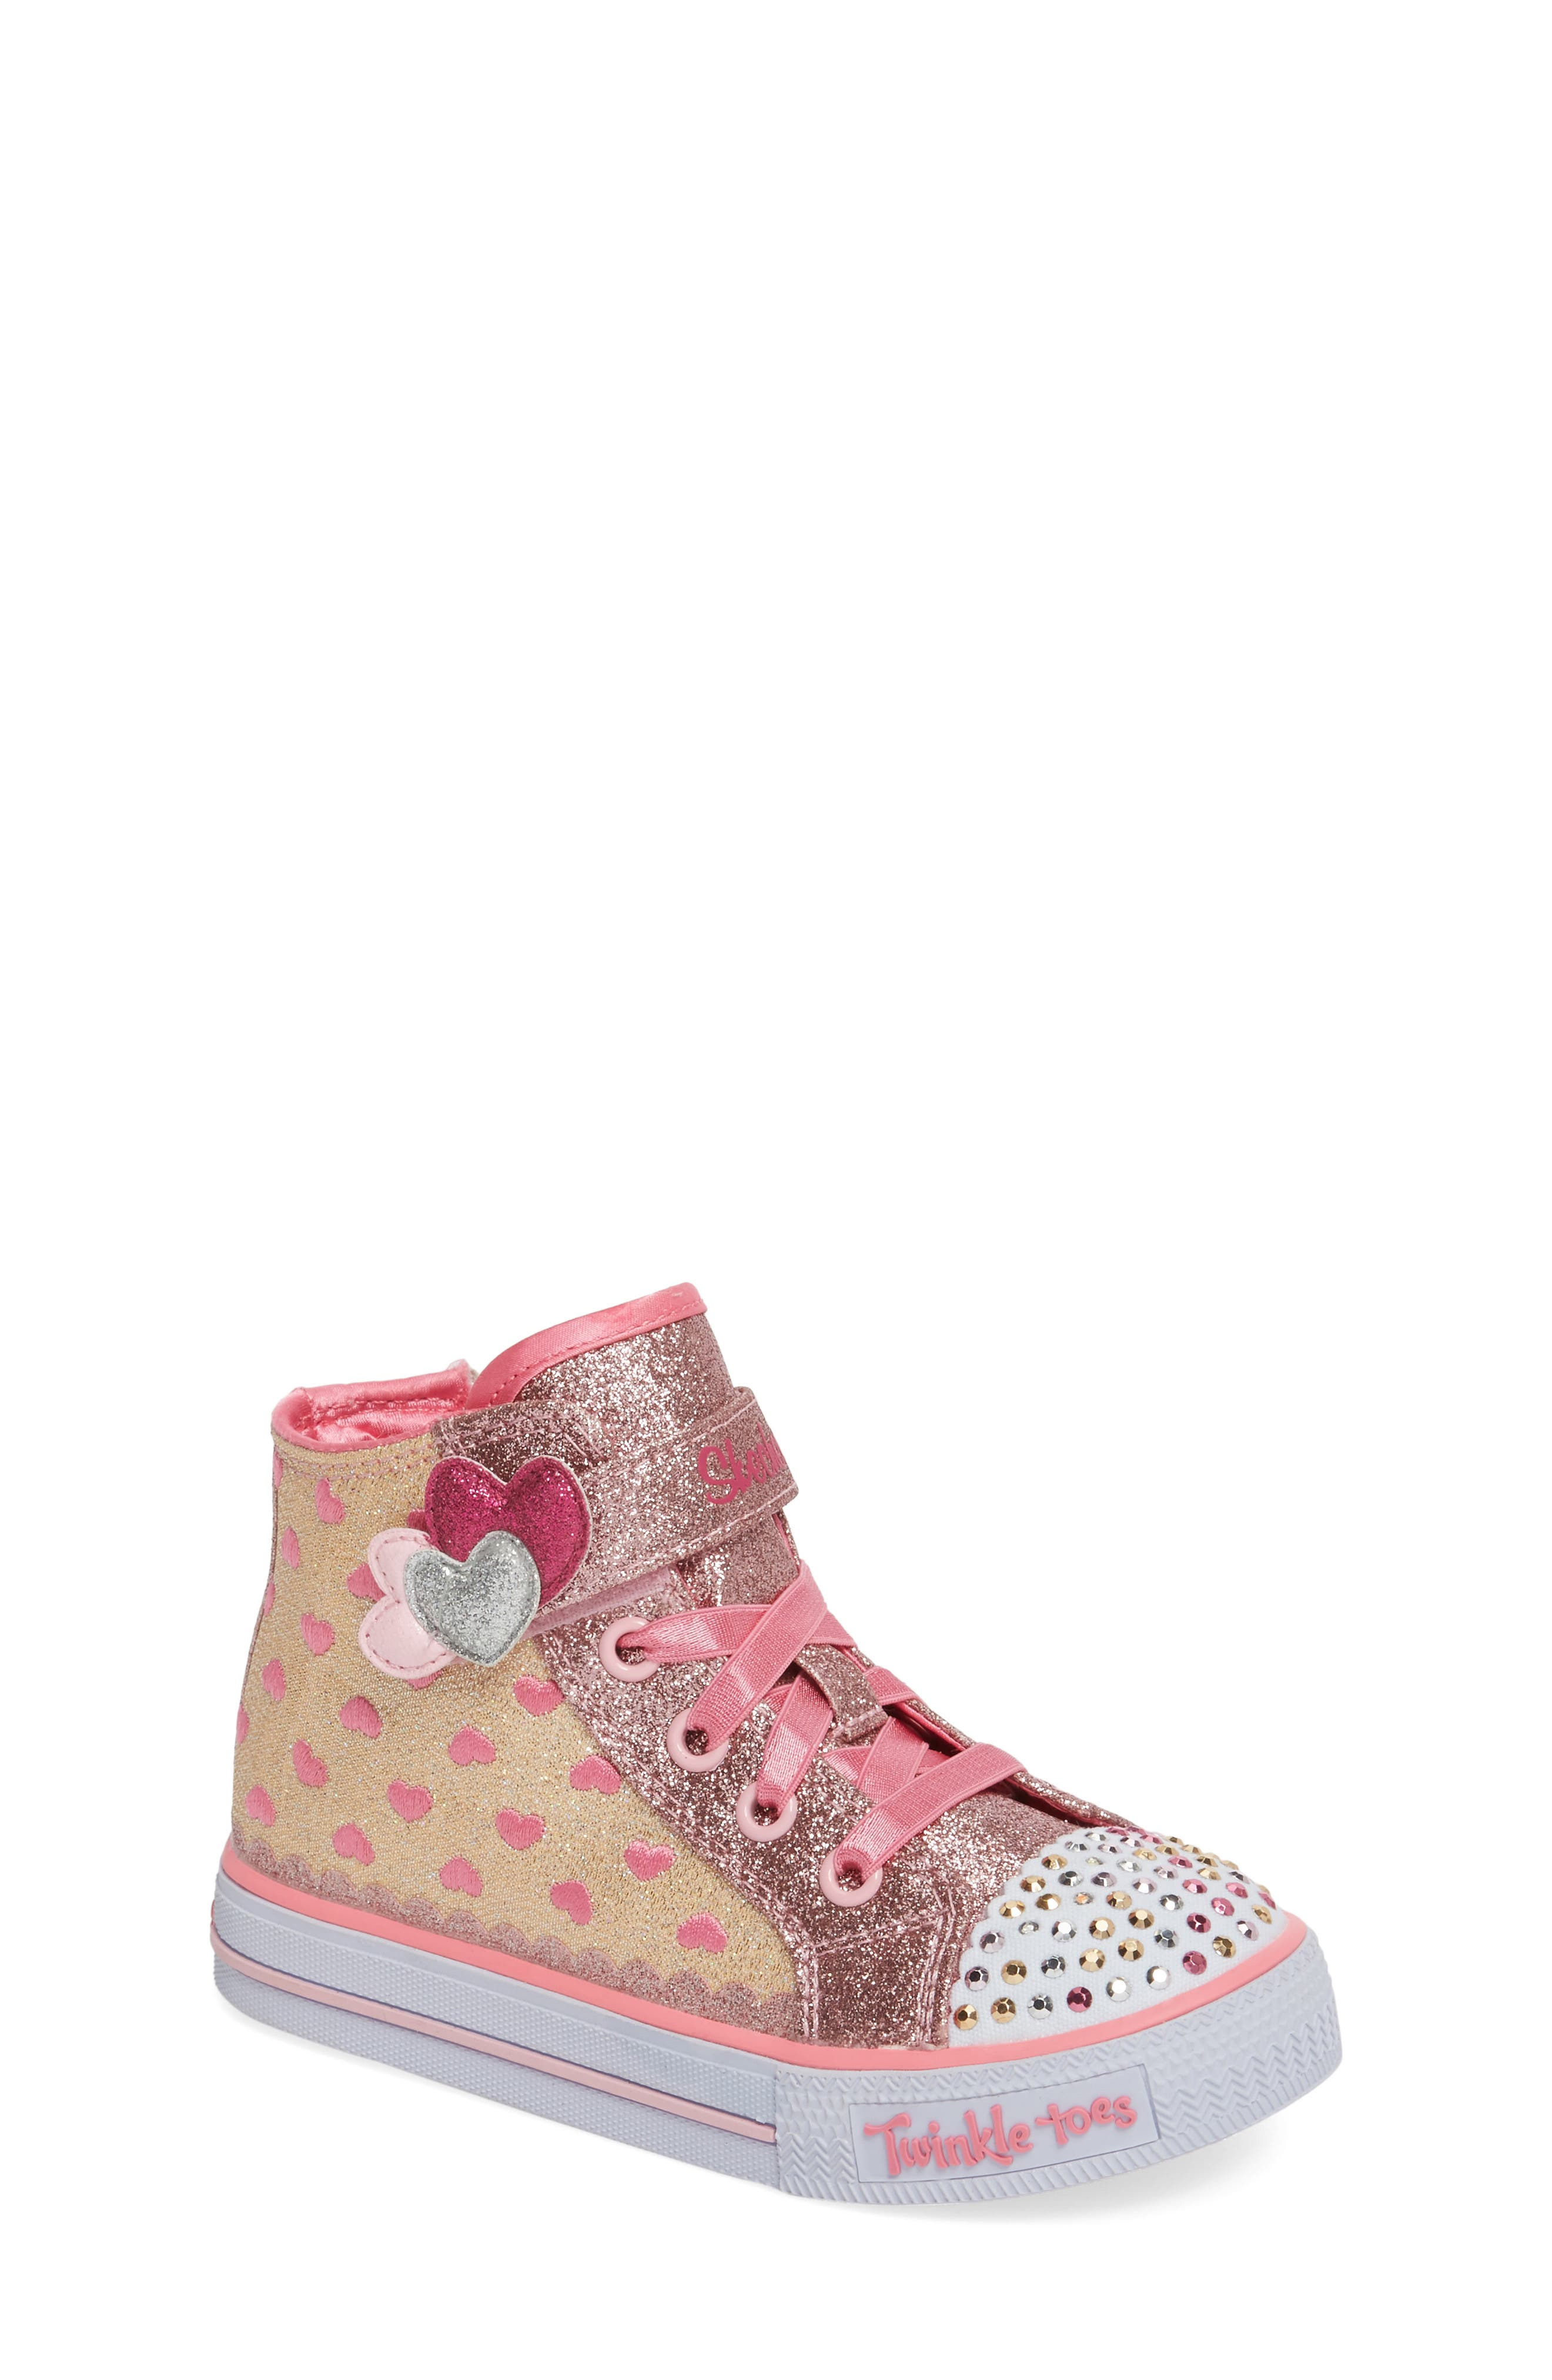 SKECHERS Twinkle Toes - Shuffles High Top Sneaker (Walker & Toddler)